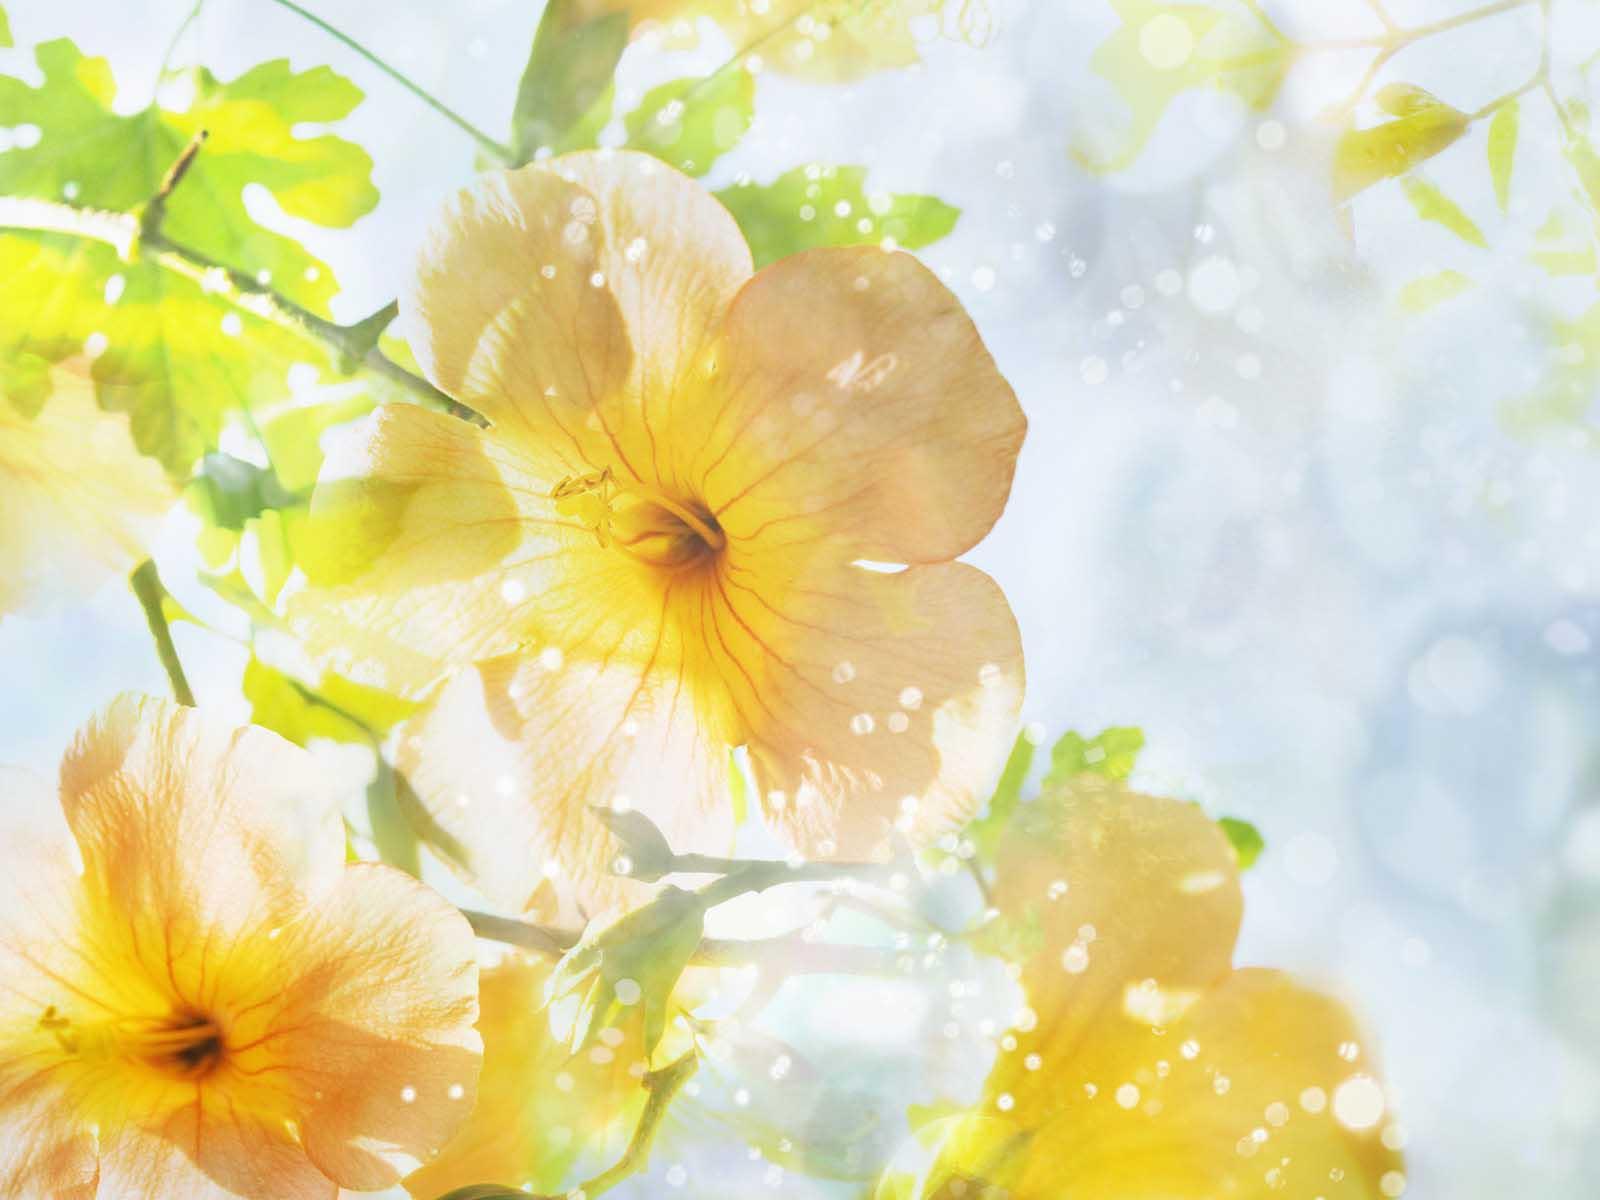 Convert View Source Ged On Summer Flowers Wallpaper Desktop 10 Background Hdflowerwallpaper